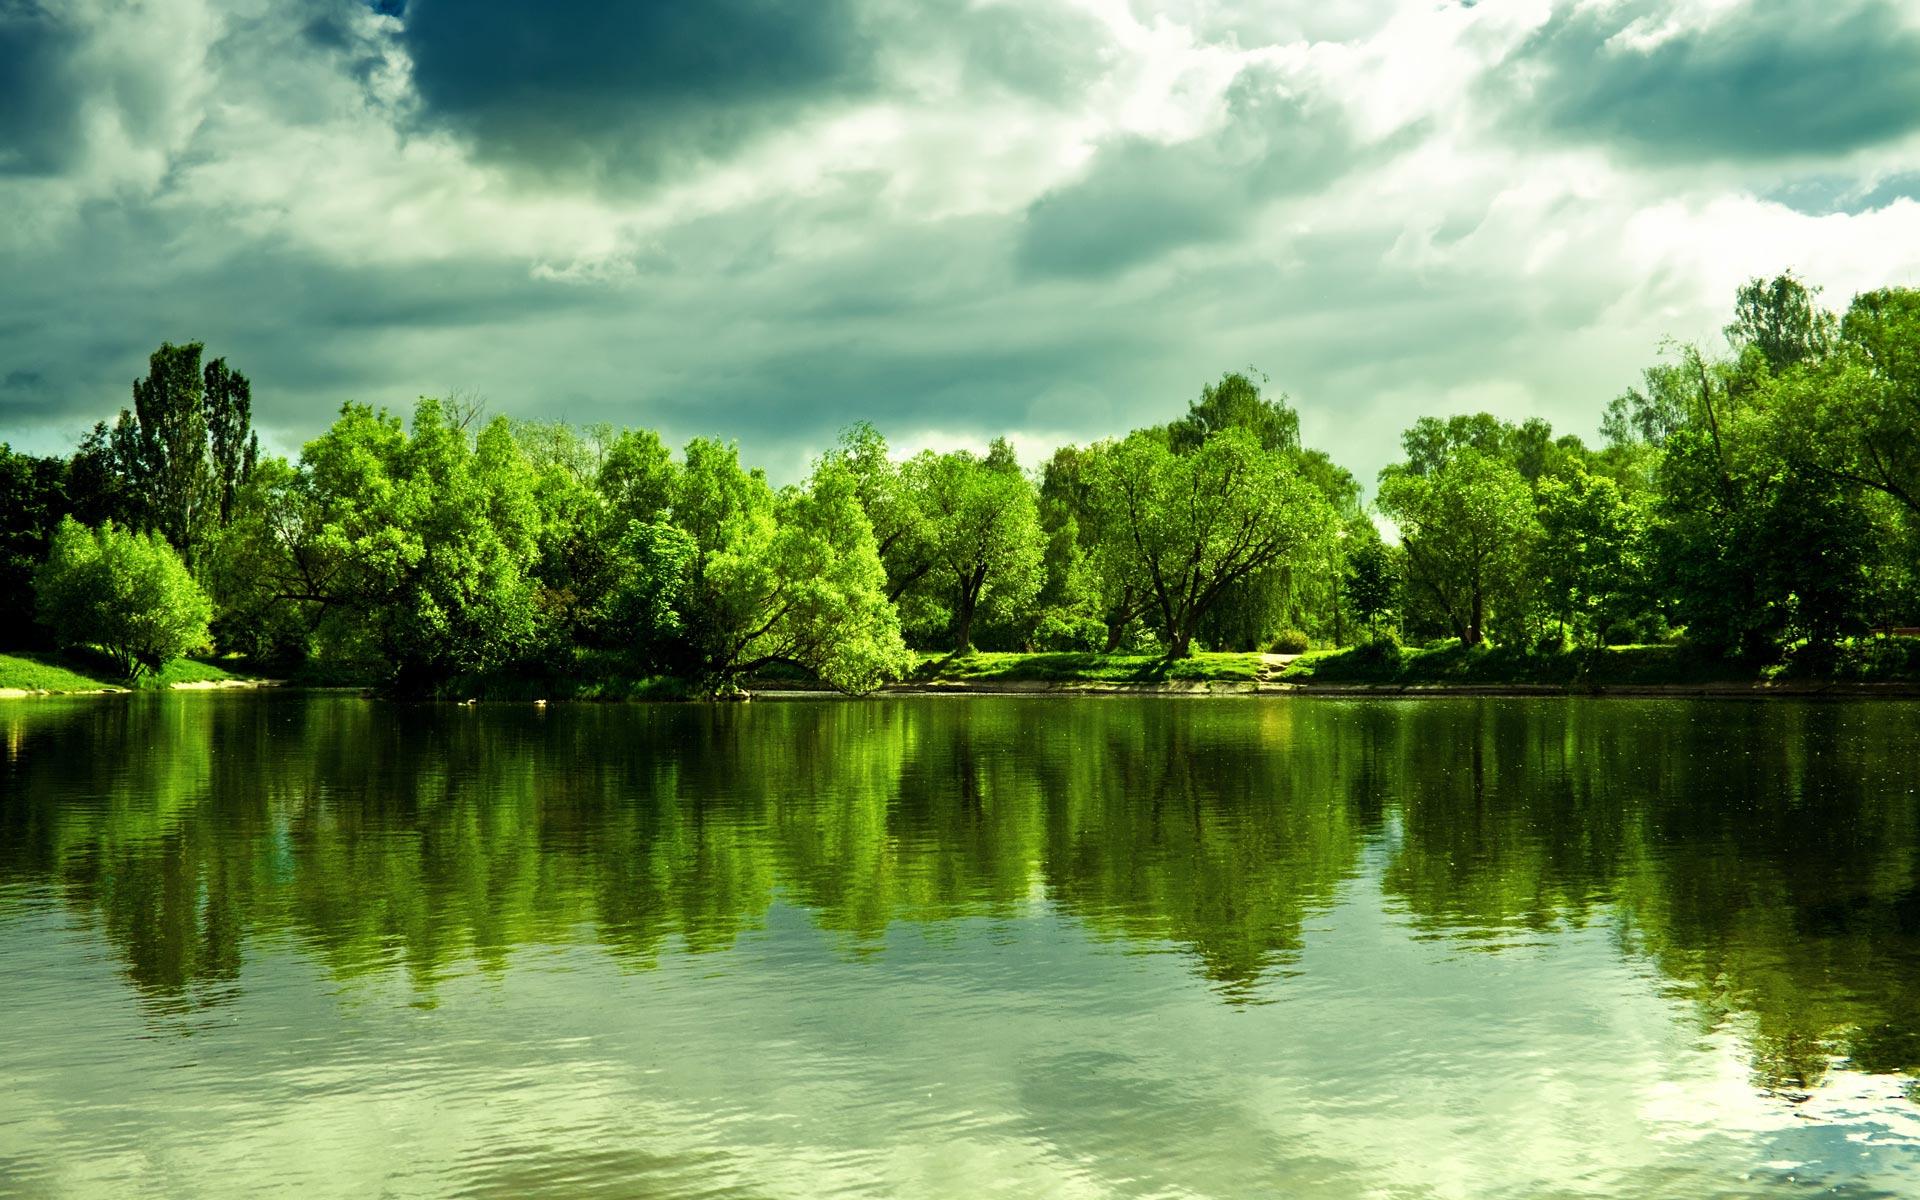 <p>Озеро в лесу</p>